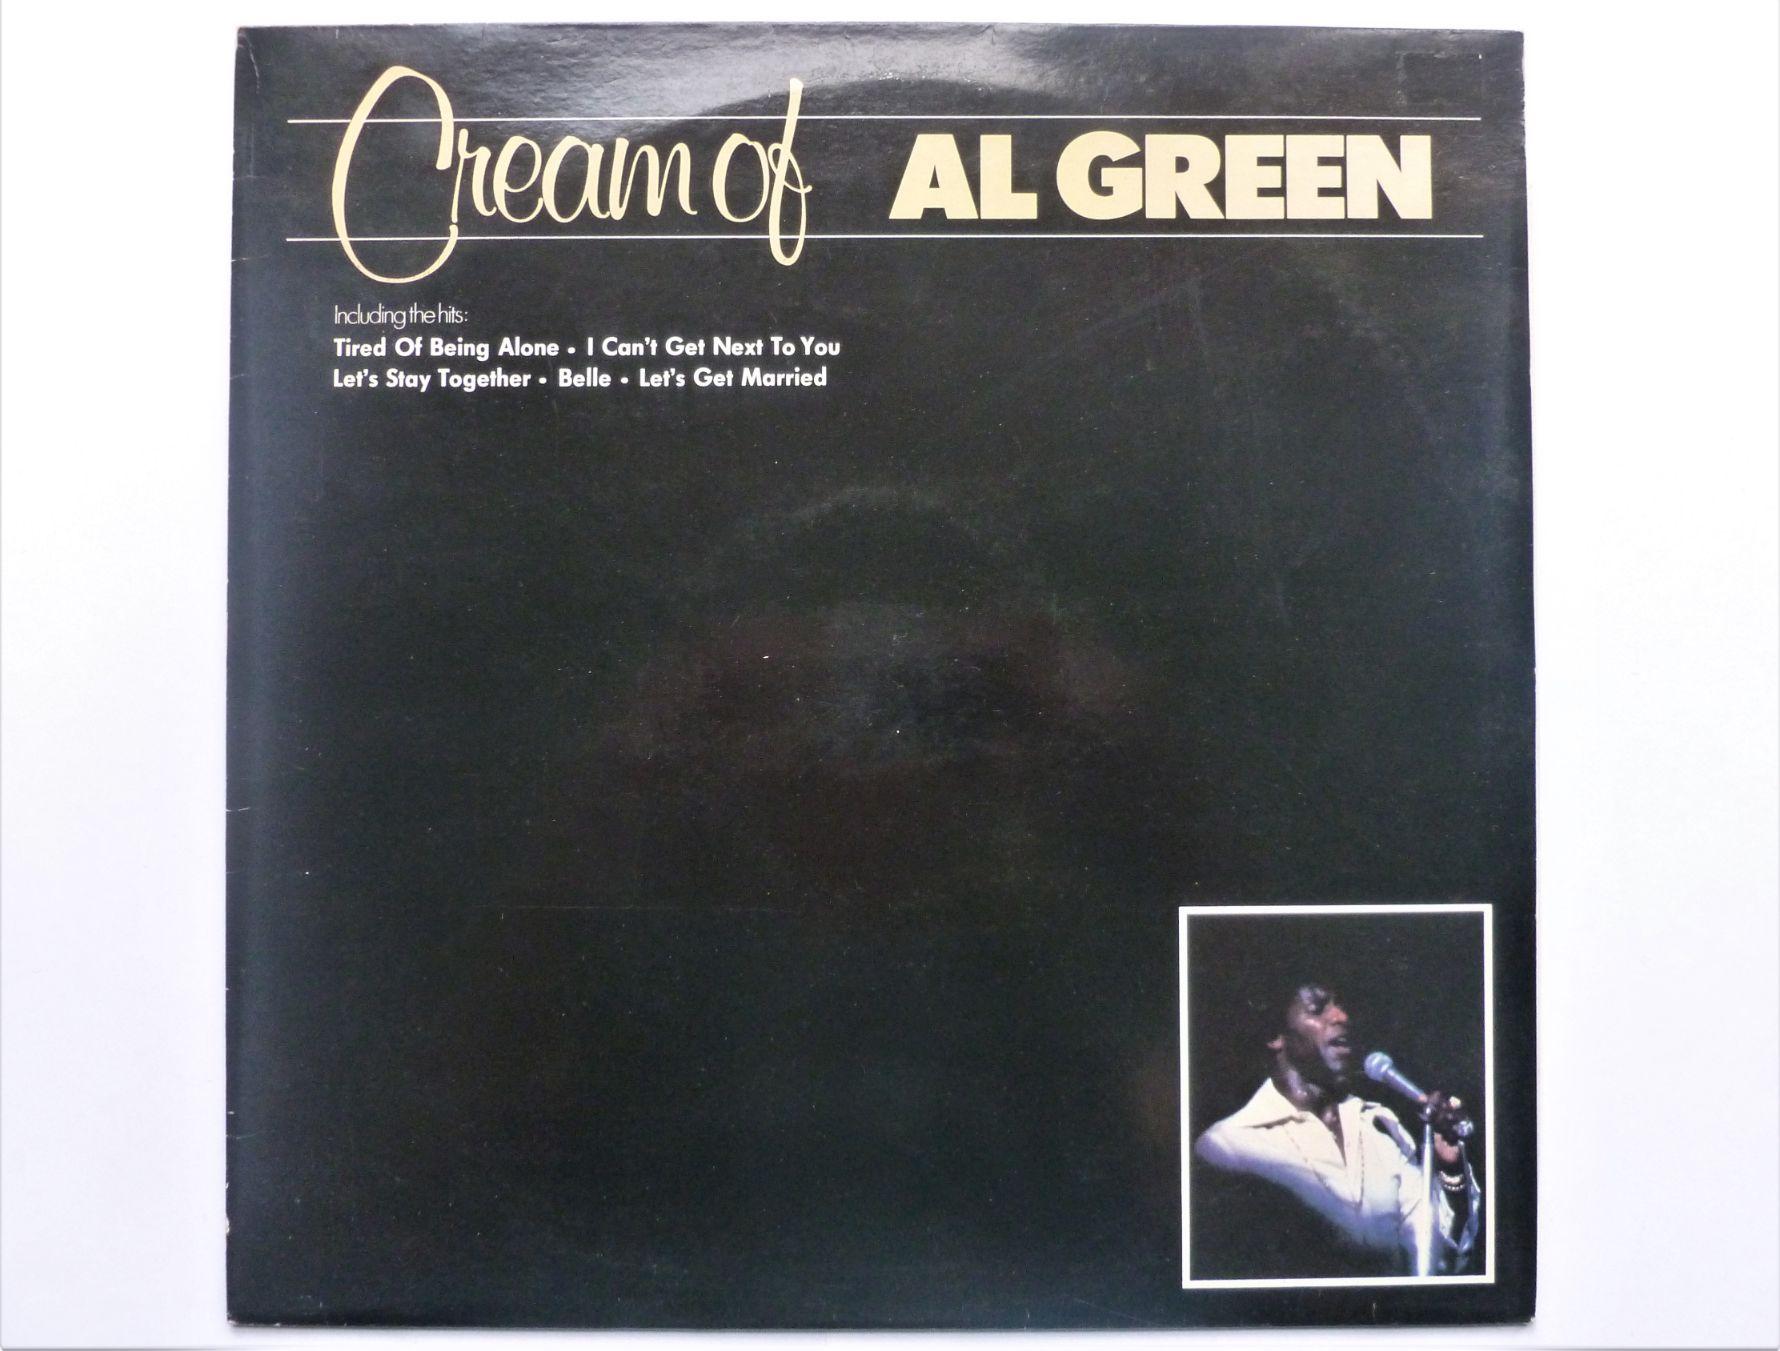 Al Green Cream Of Al Green